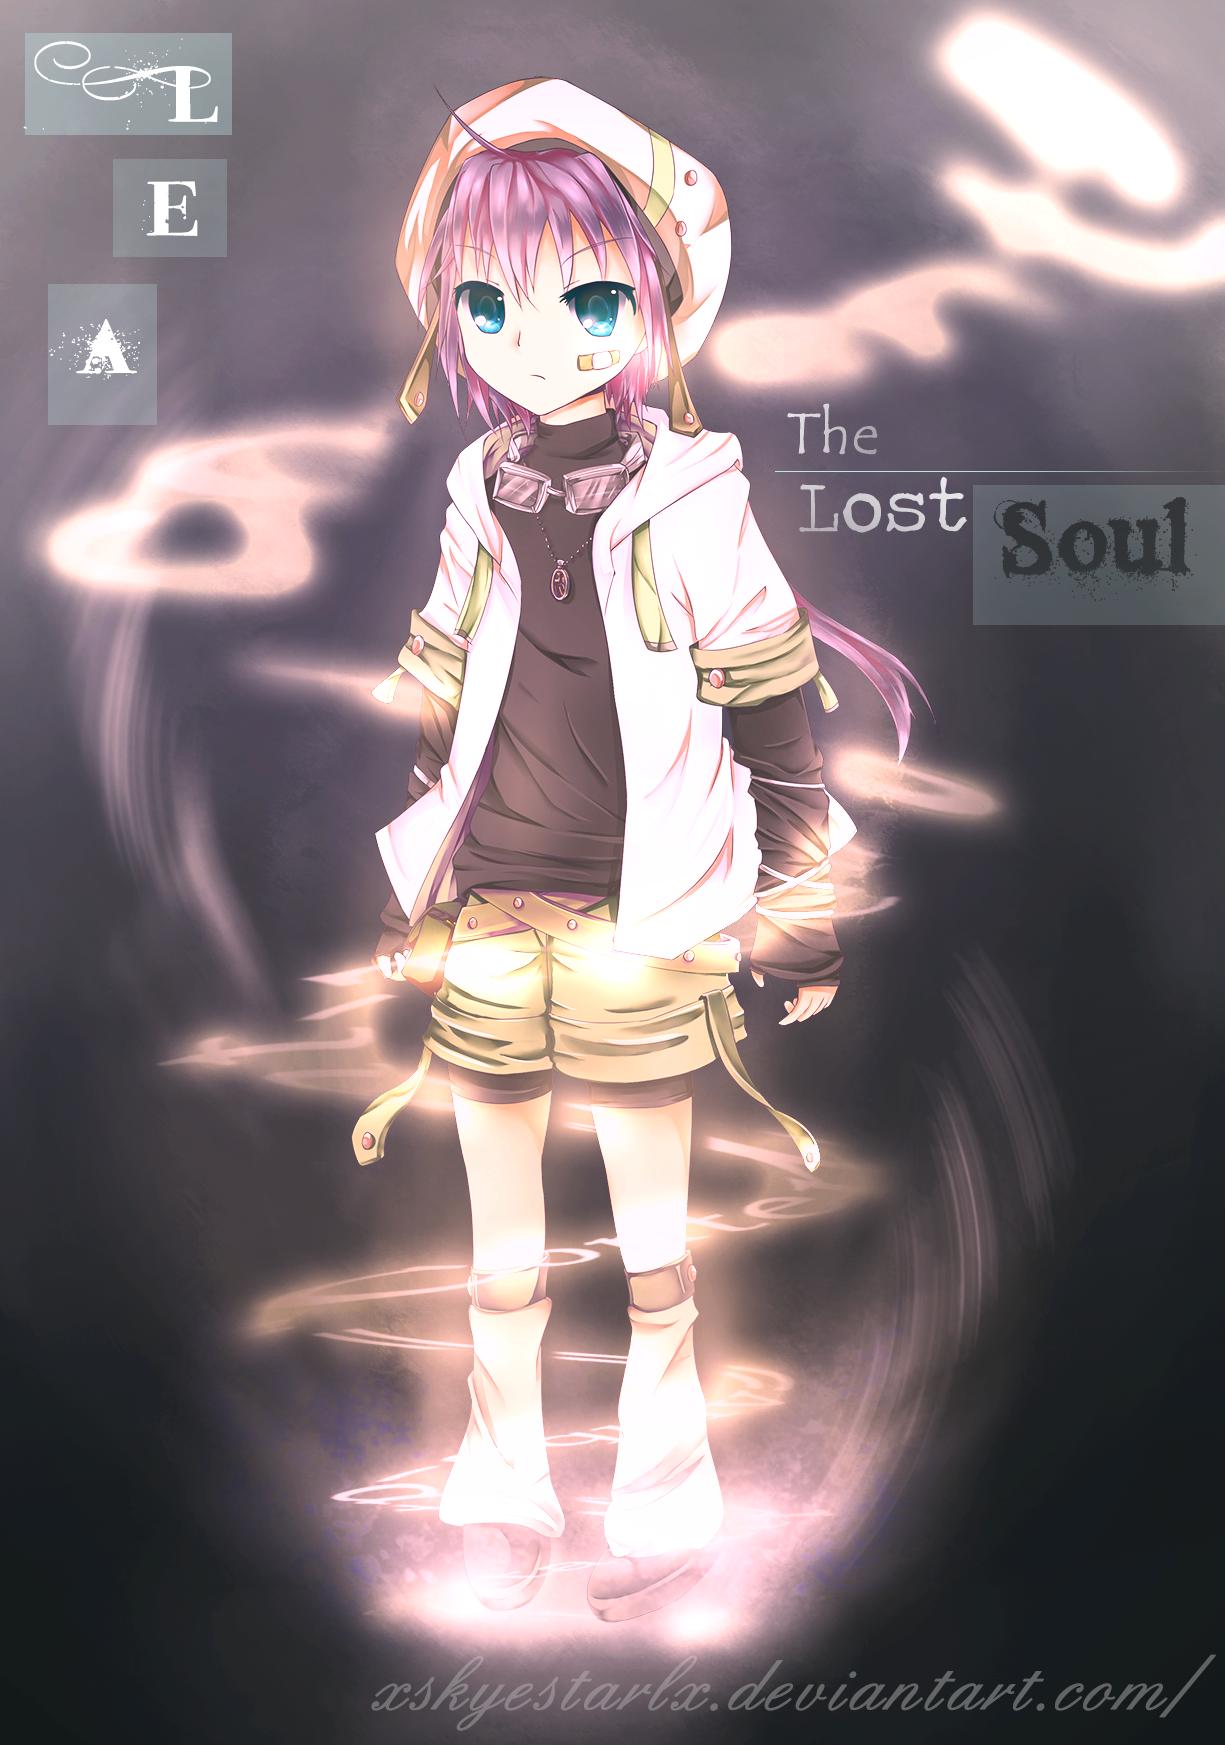 Lost Soul Doom Deviantart: The Lost Soul By Syea On DeviantArt